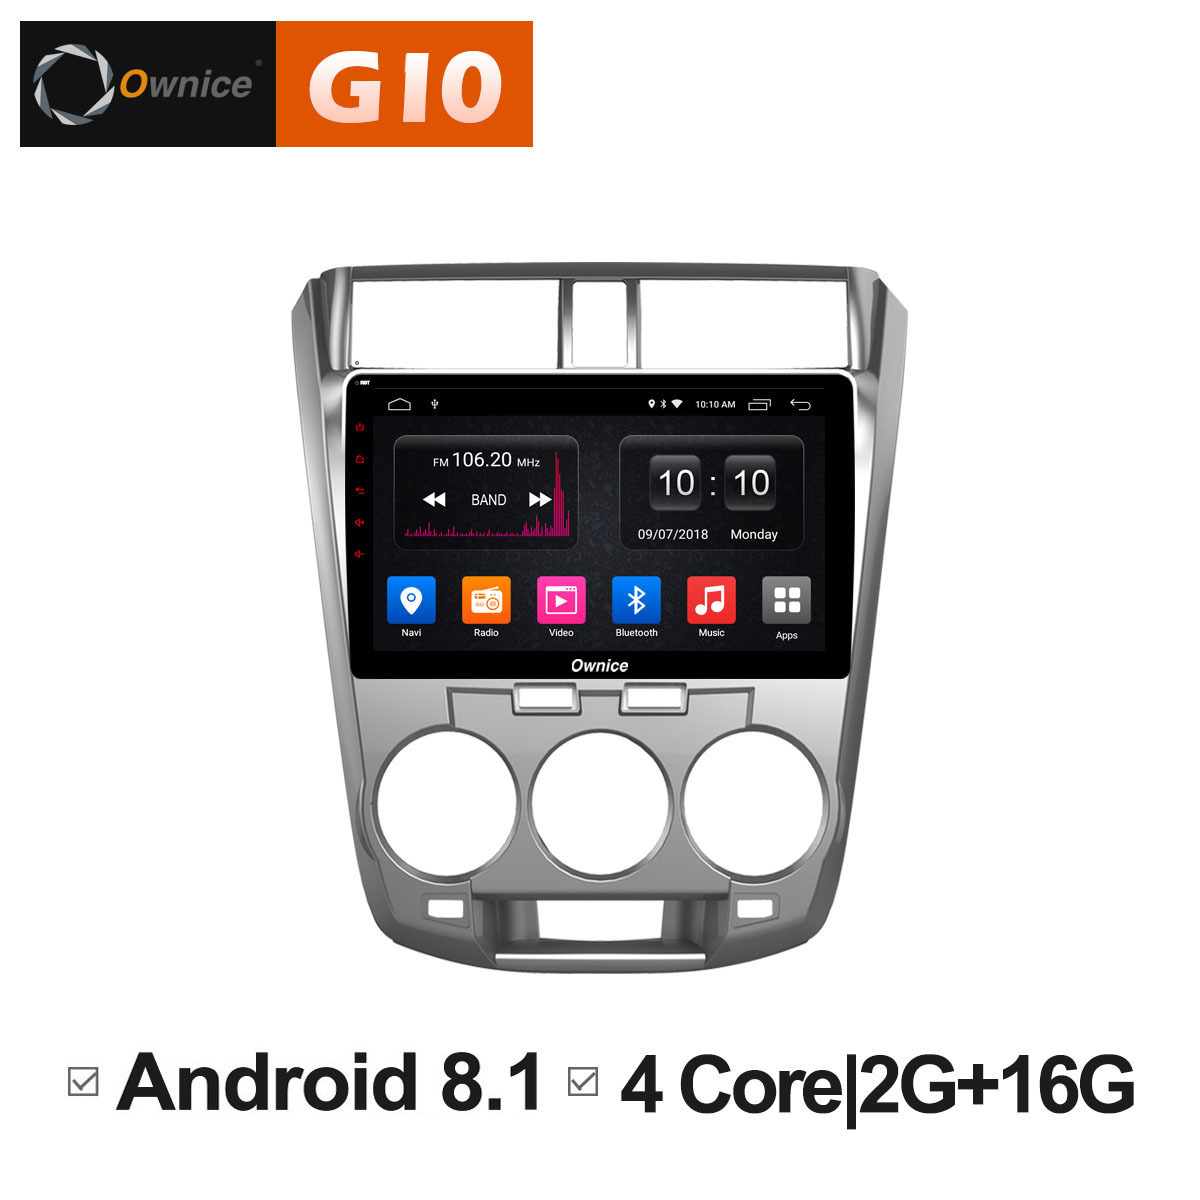 Android 8.1 Unit Car radio Multimedia Video DVD player for HONDA CITY 2009 2010 2011 2012 2013 2014 Car GPS Navi Intelligent PC цена 2017